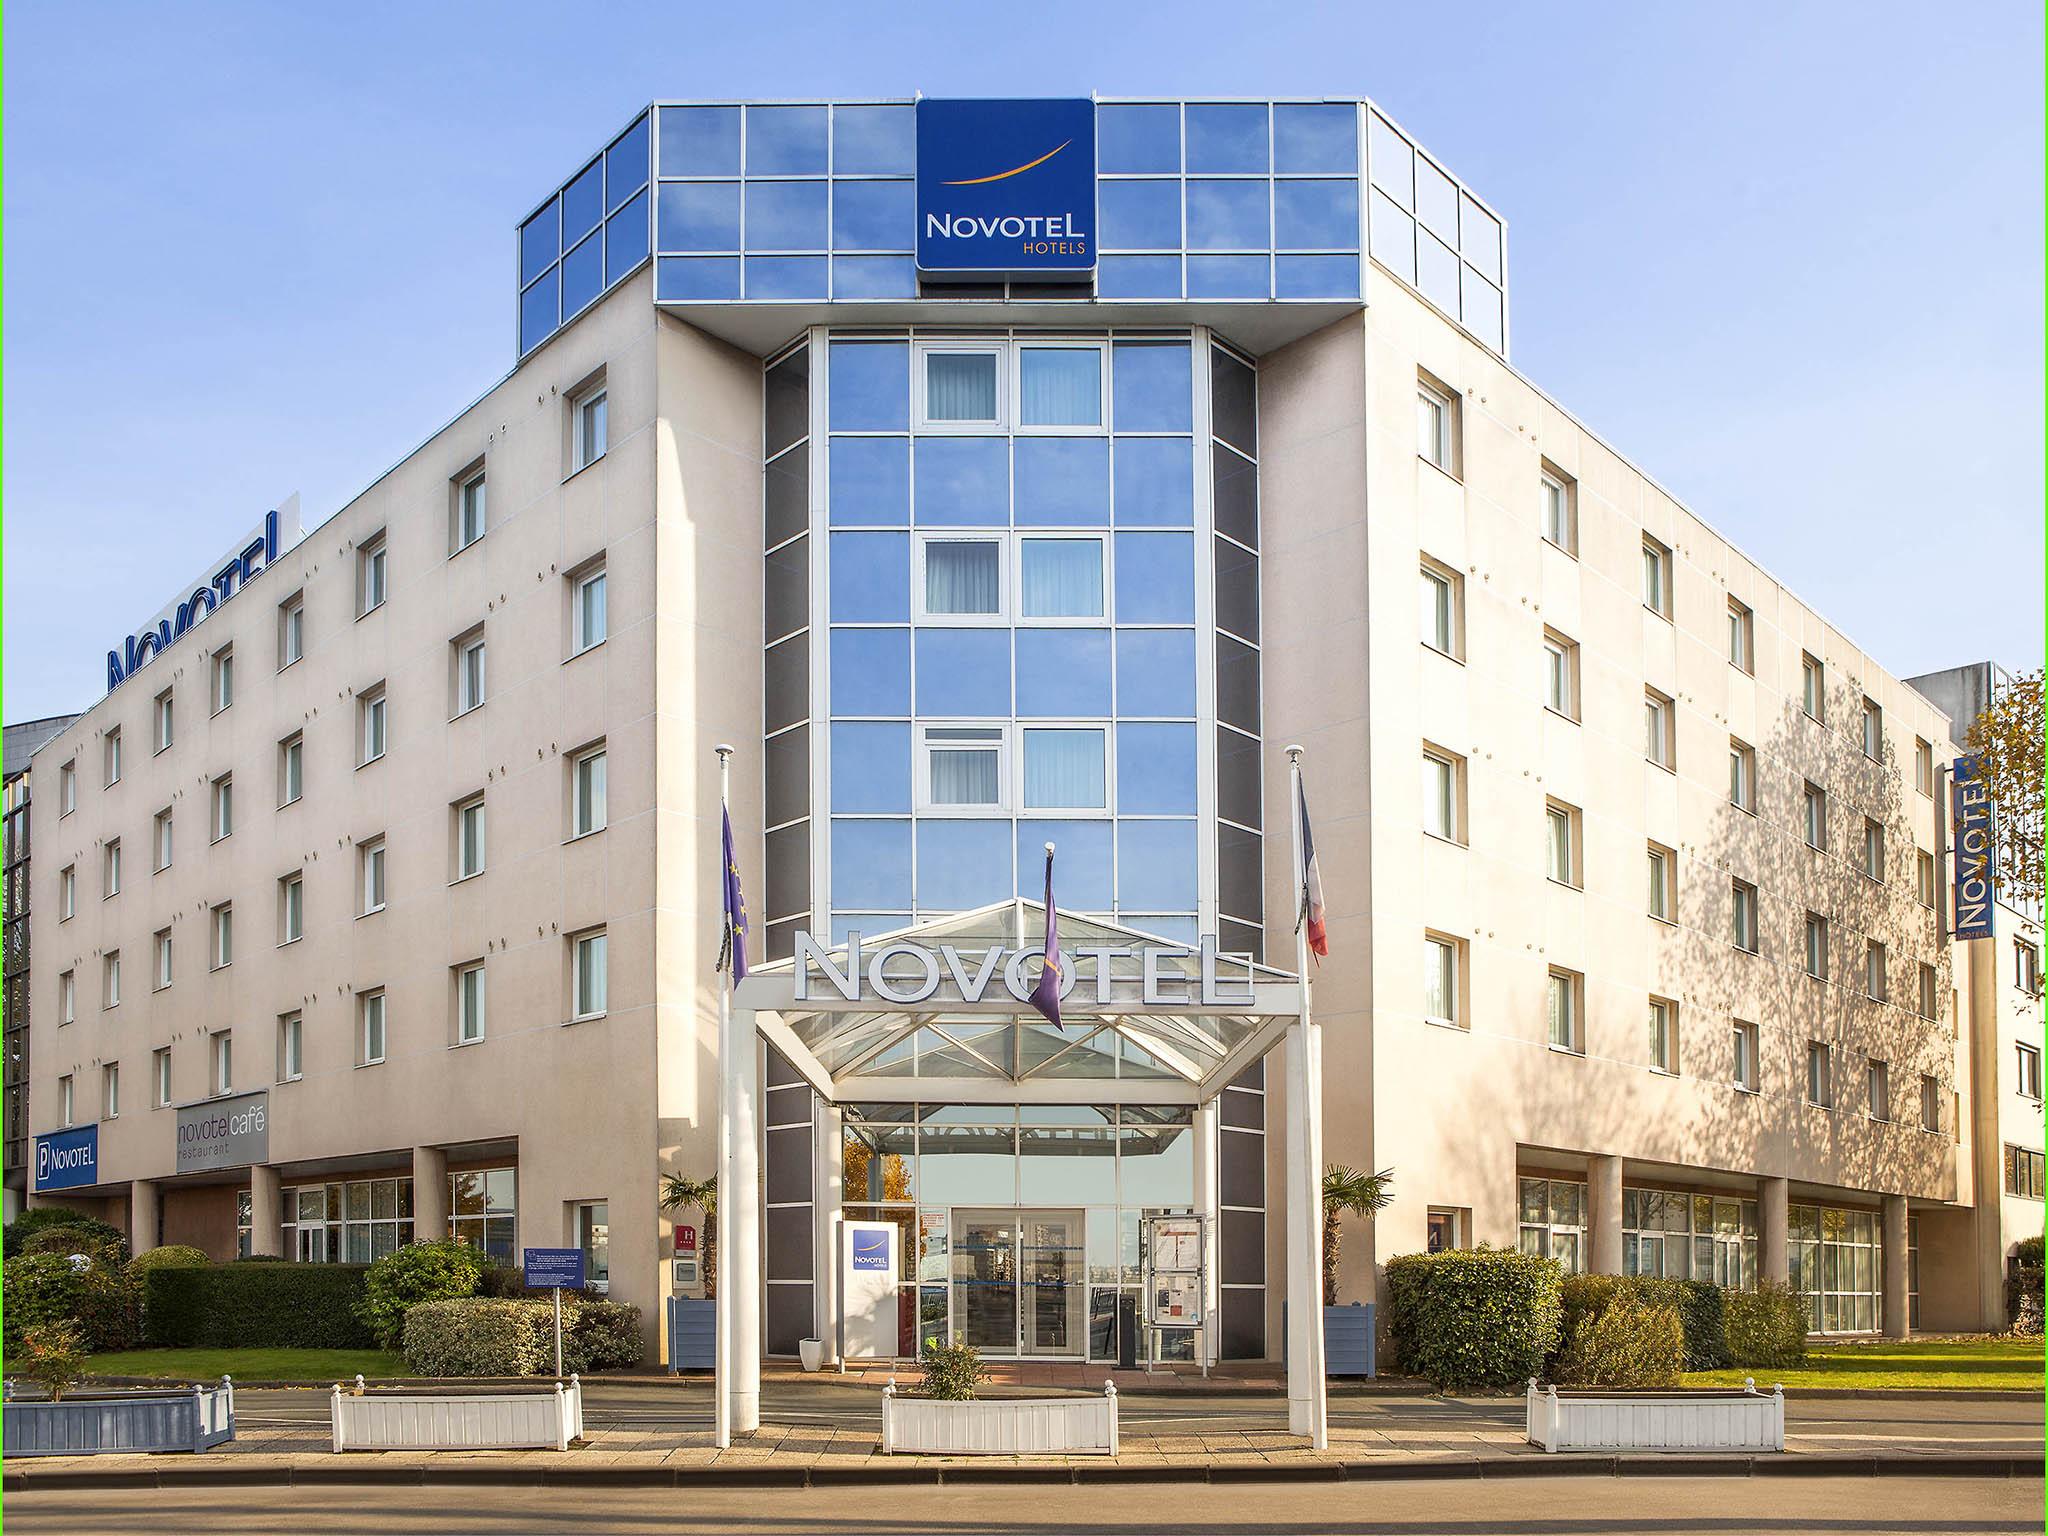 Hotell – Novotel Nantes Centre Bord de Loire